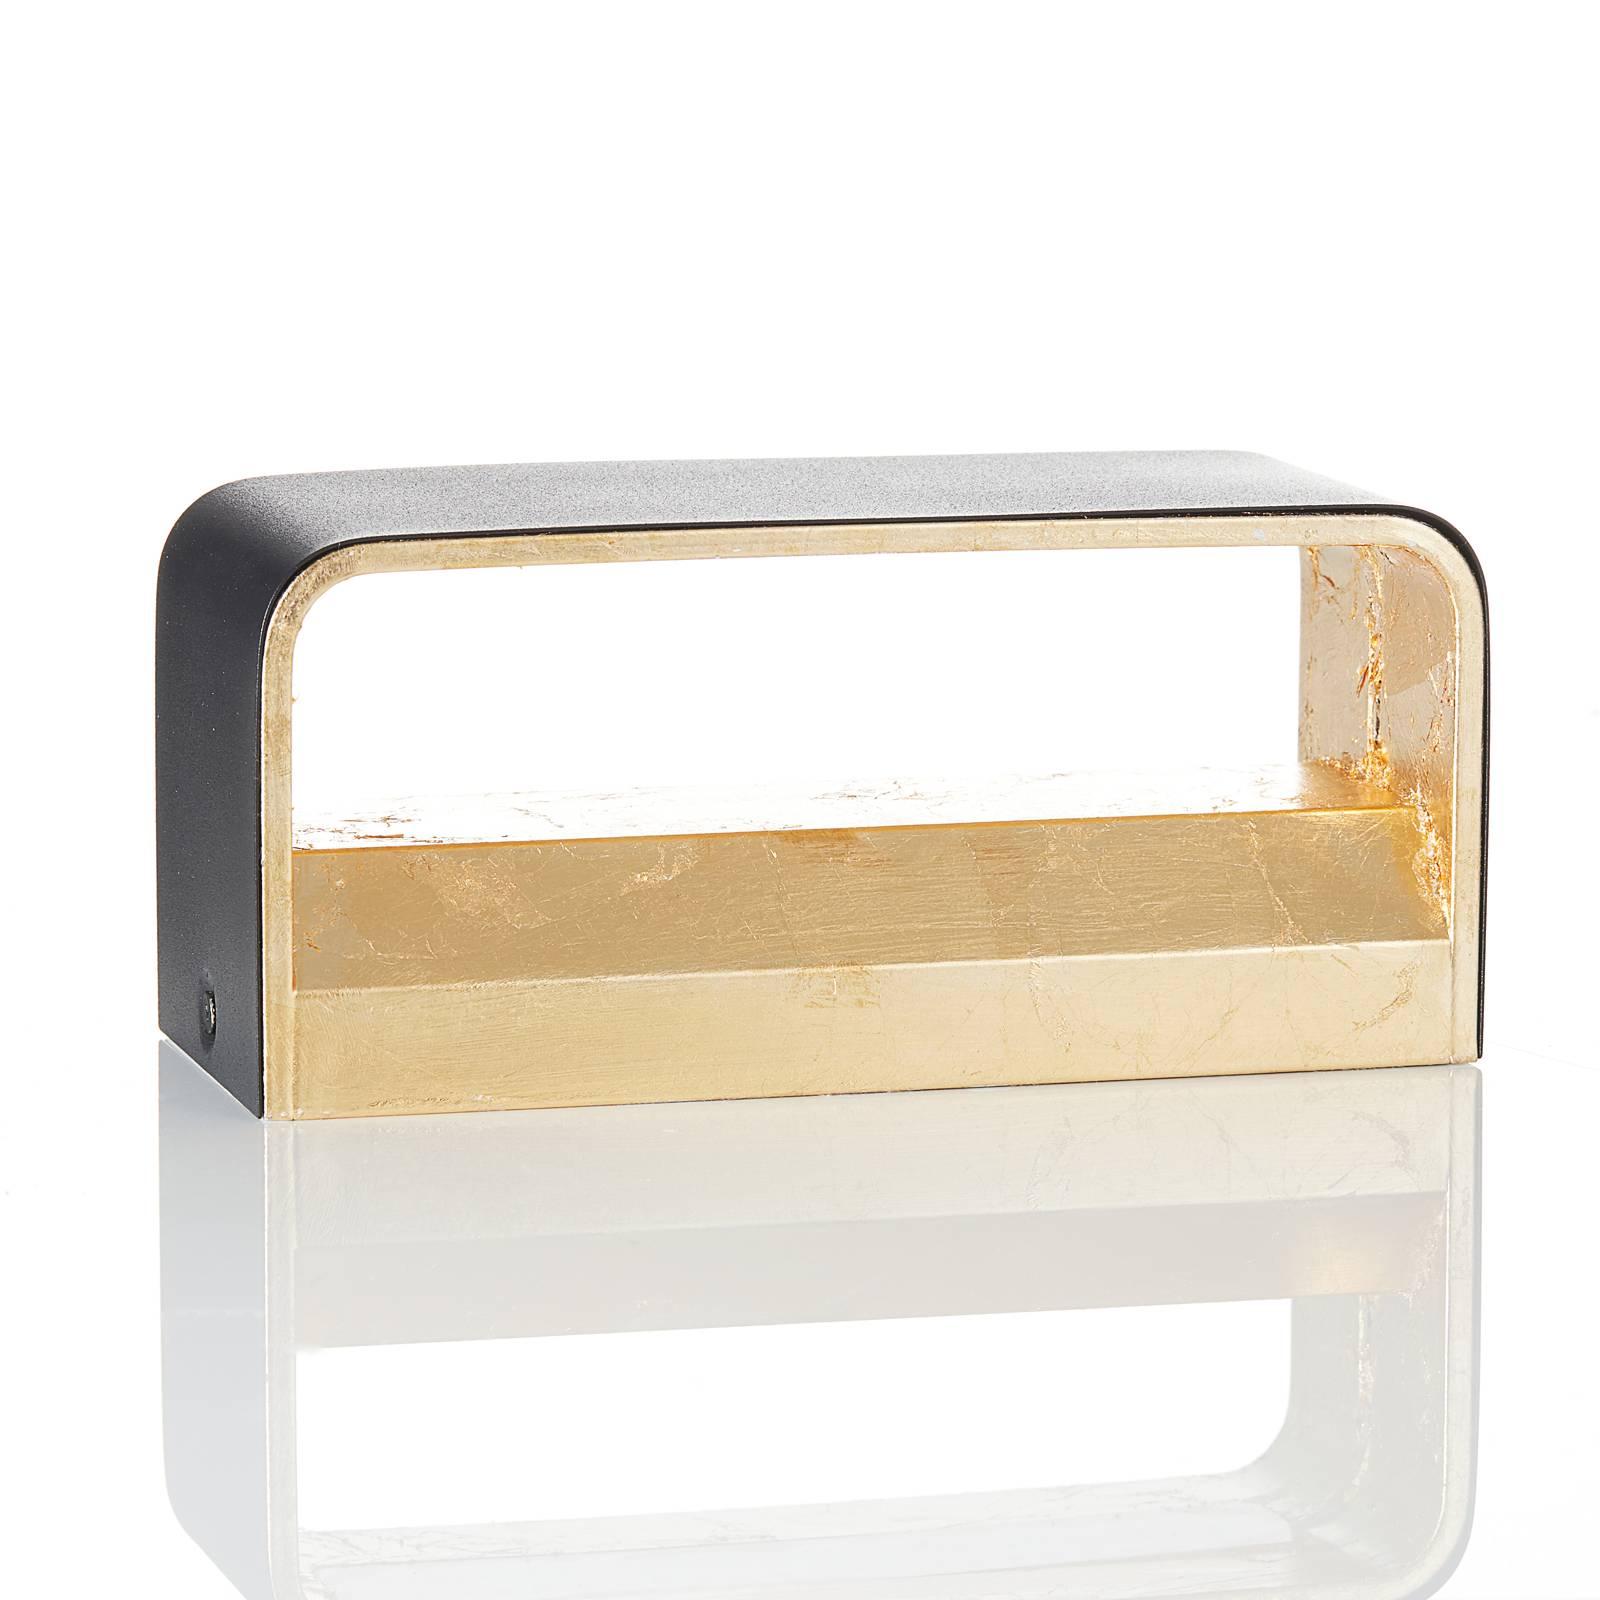 Lucande Sessa -LED-seinävalaisin 20 cm musta/kulta